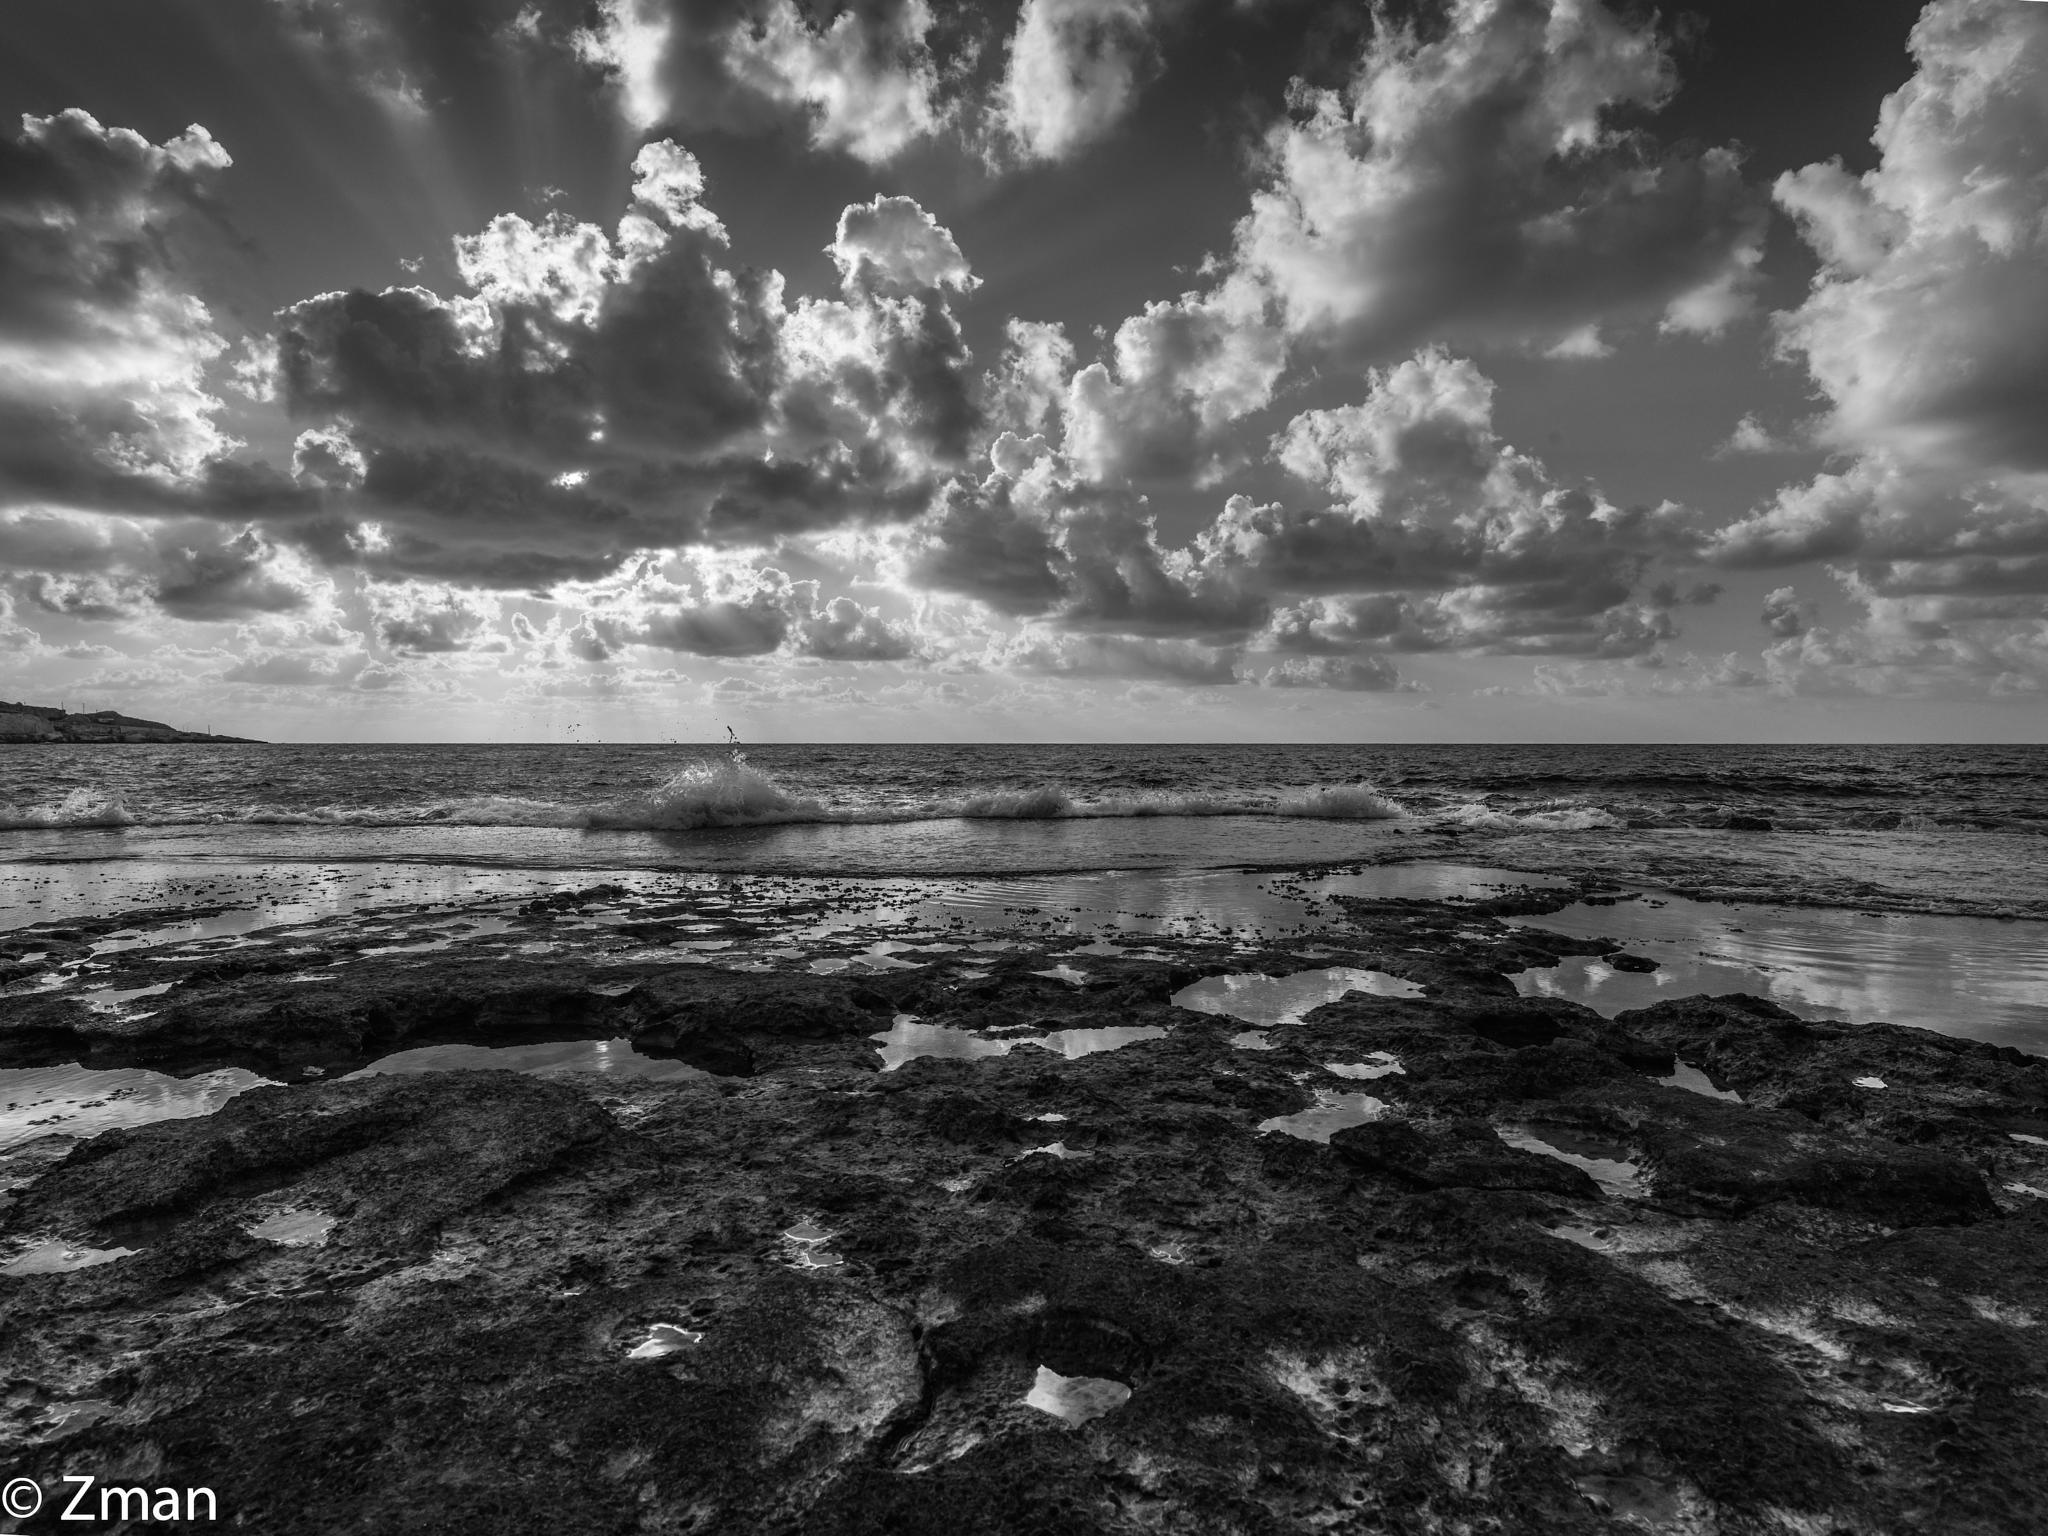 Al Naqoura Beach by muhammad.nasser.963